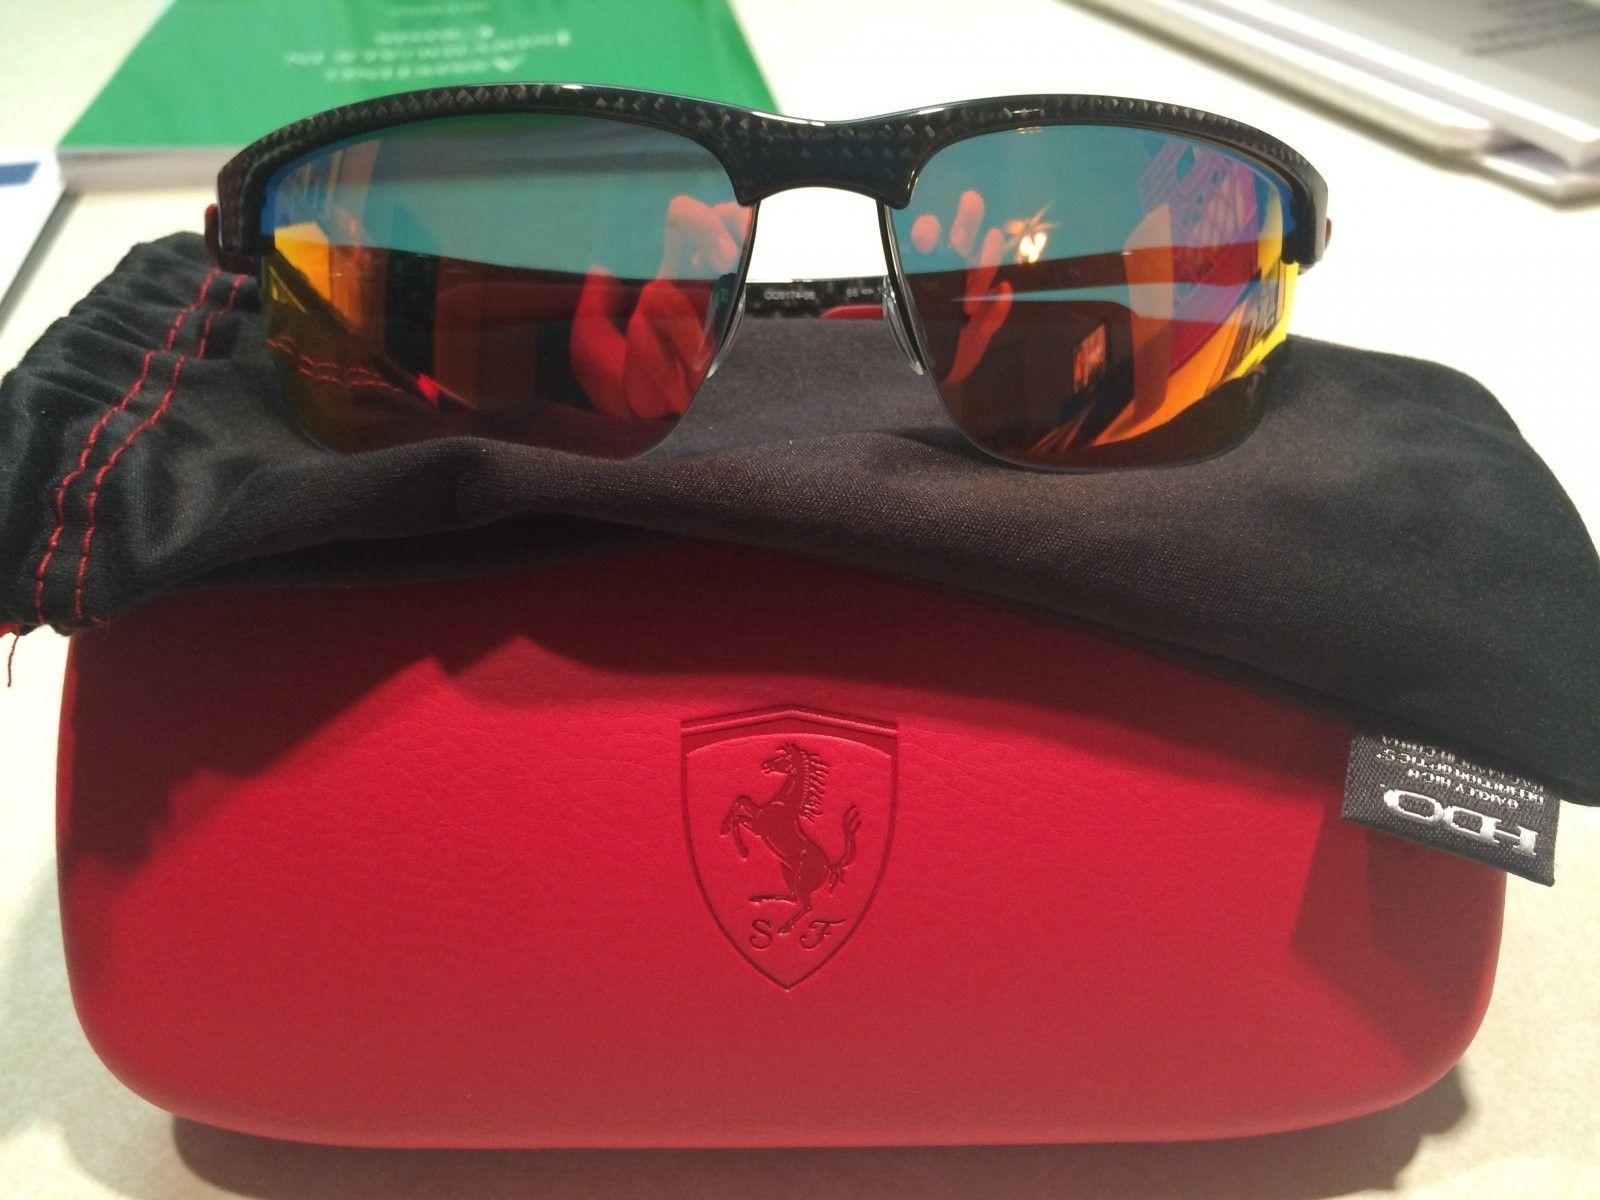 Today's purchase - Black/Red RadarLocks - photo 2 (1).JPG